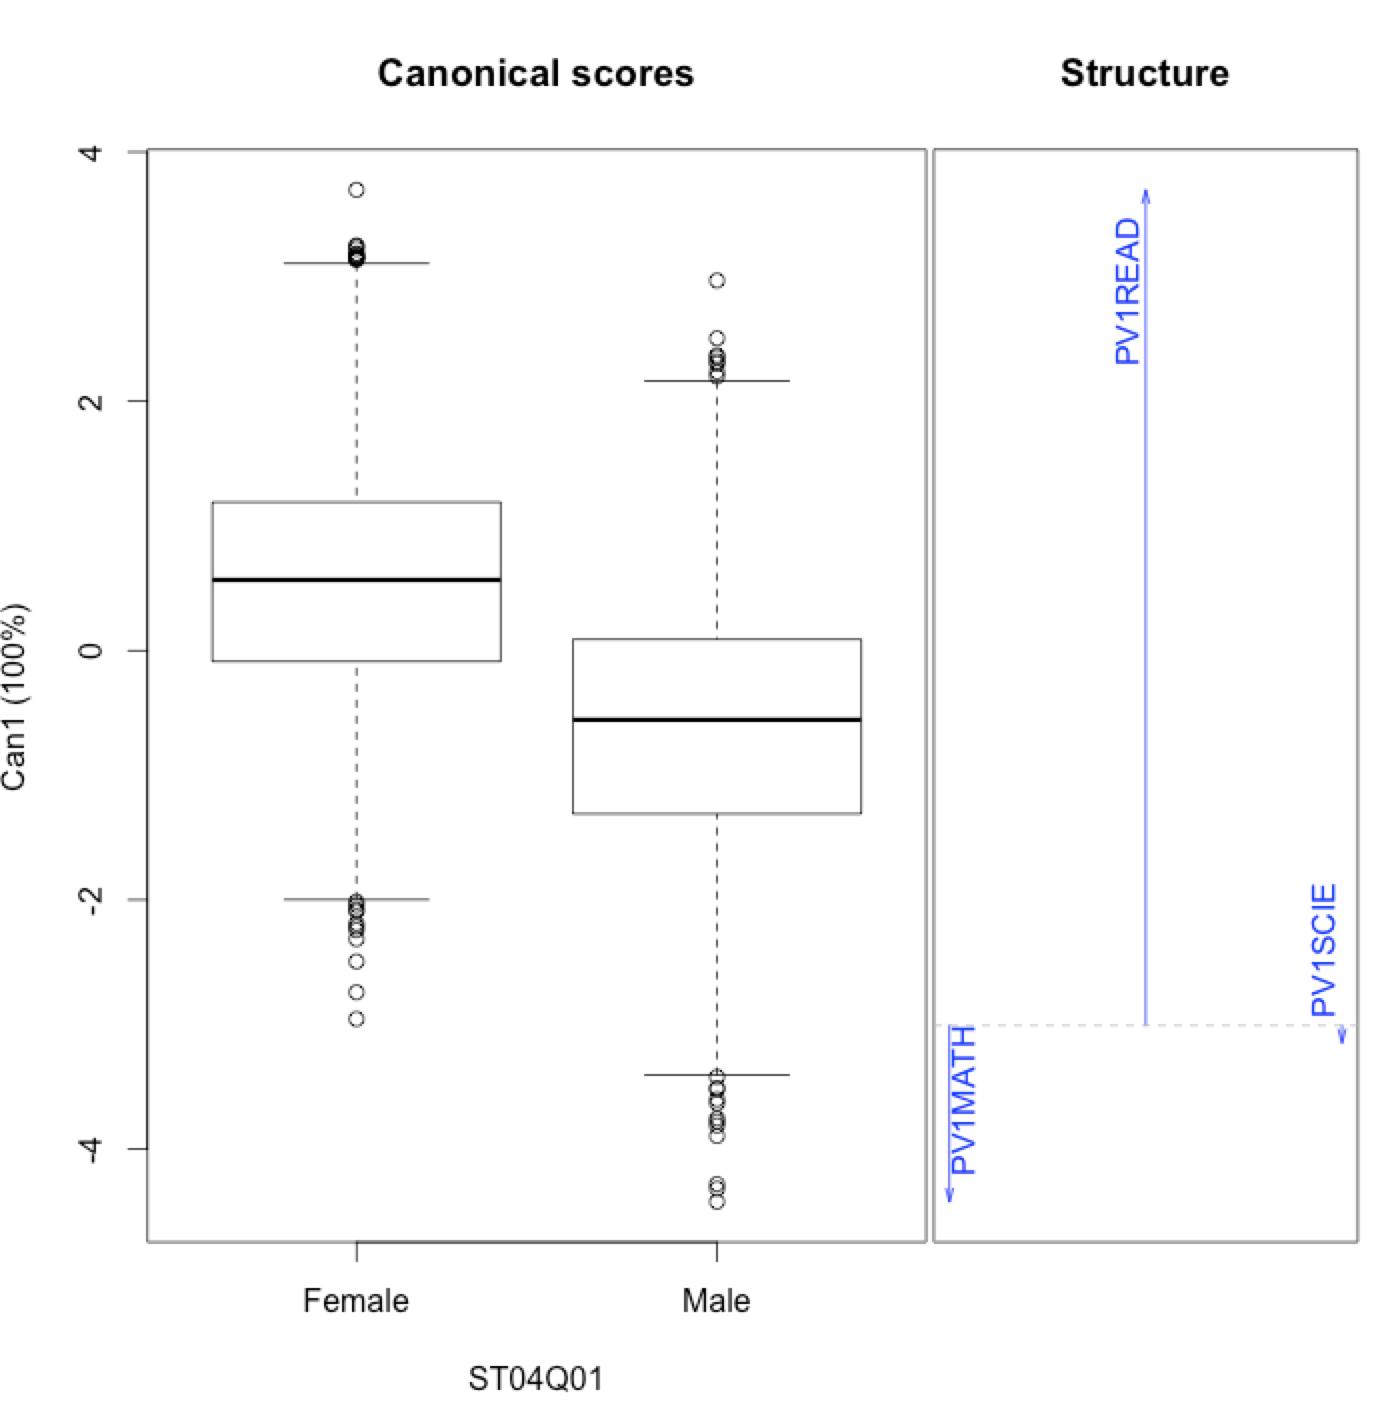 Canonical discriminant analysis